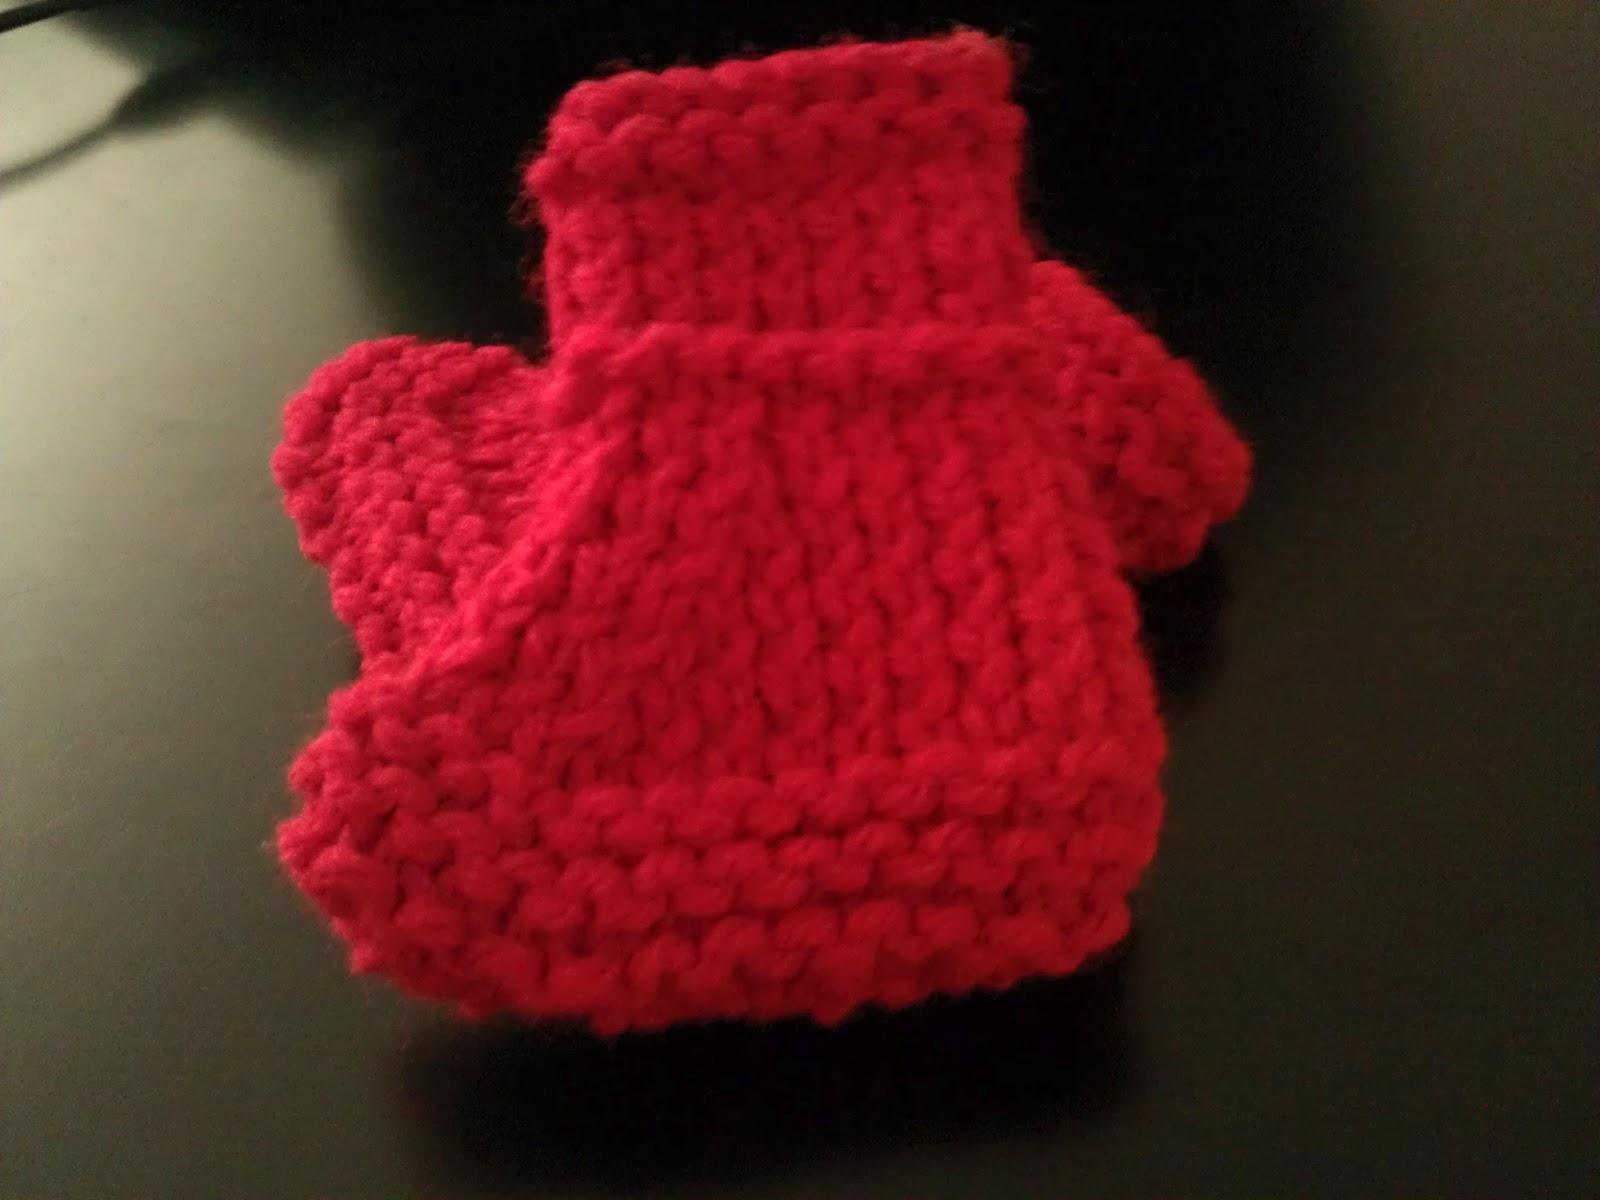 The Crafting Diva: Free Knitting Pattern: Preemie/Newborn Booties